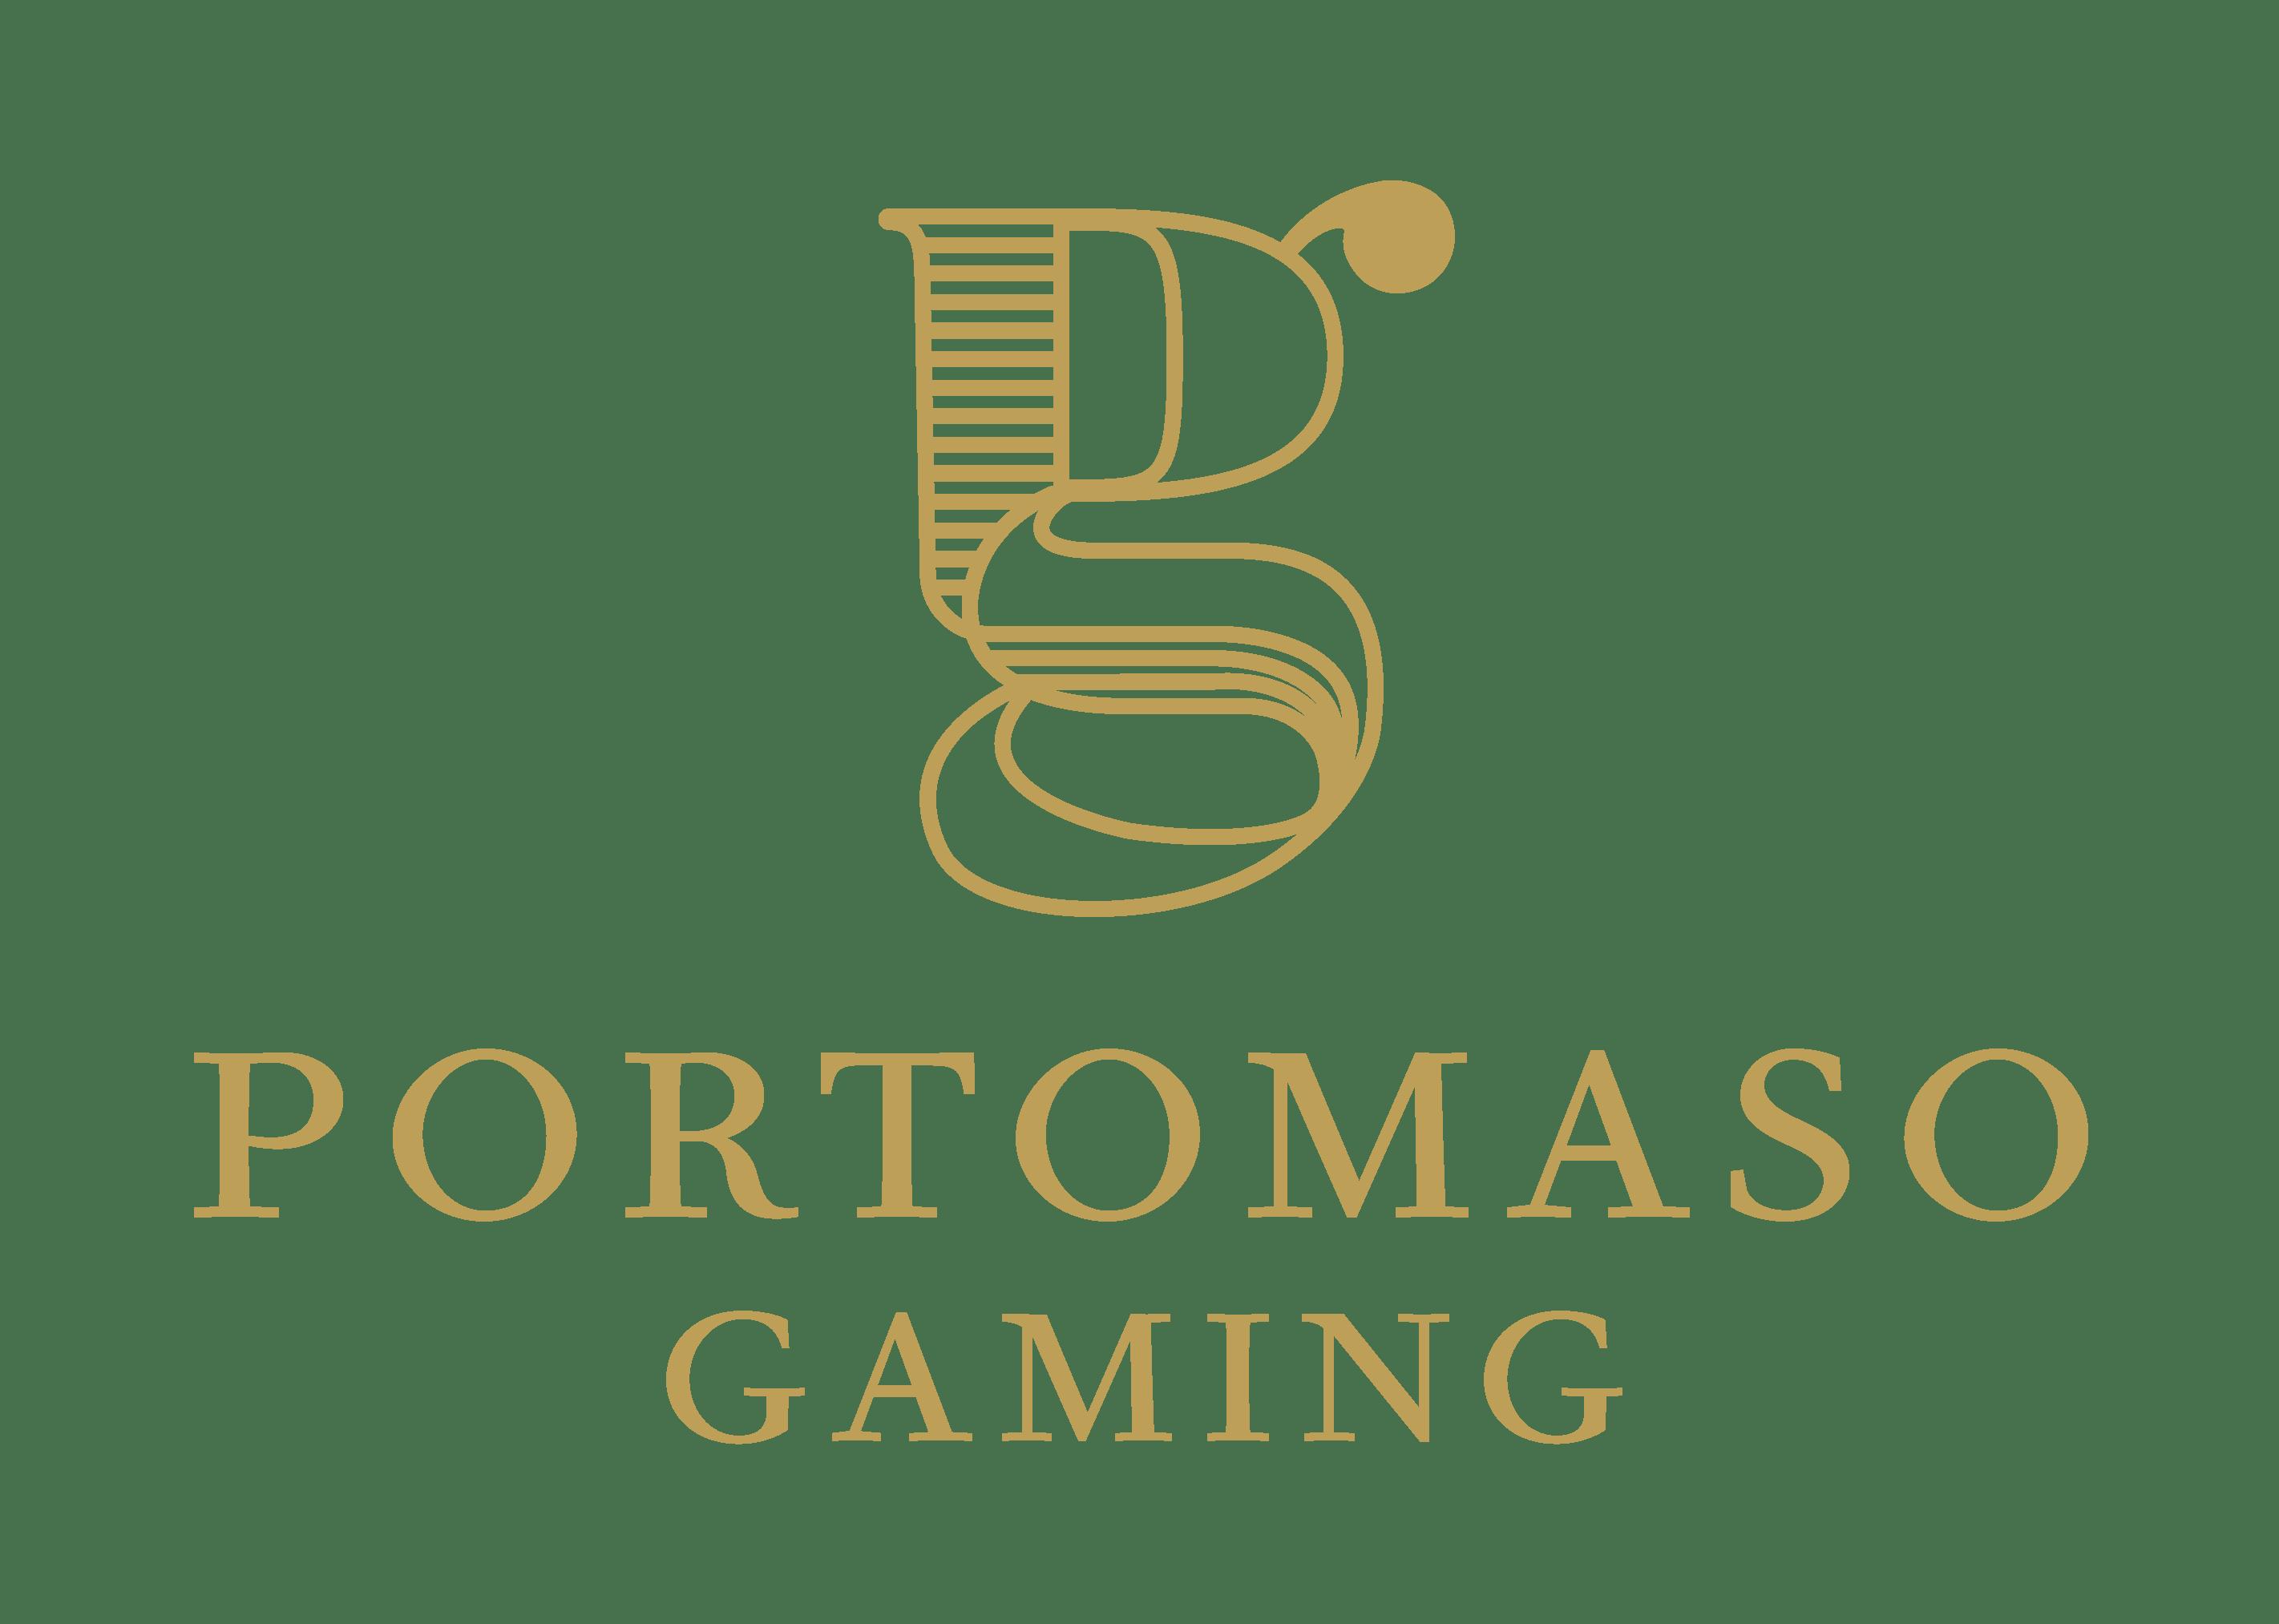 Portomaso Gaming 游戏